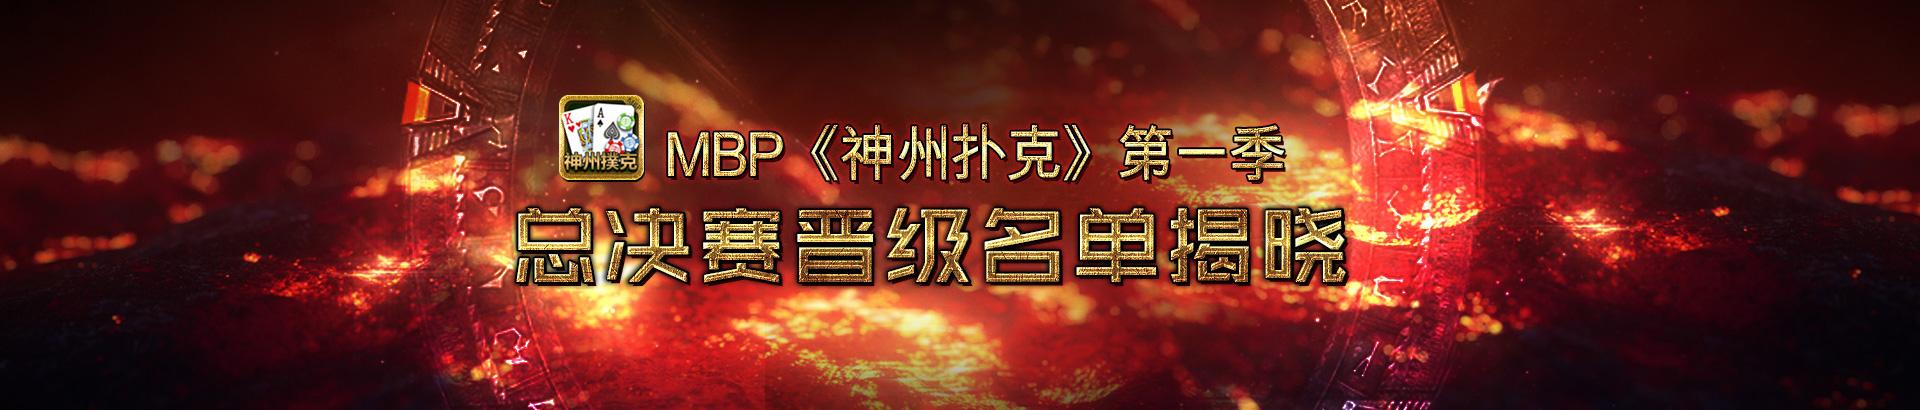 MBP《神州扑克》第一季总决赛晋级名单揭晓